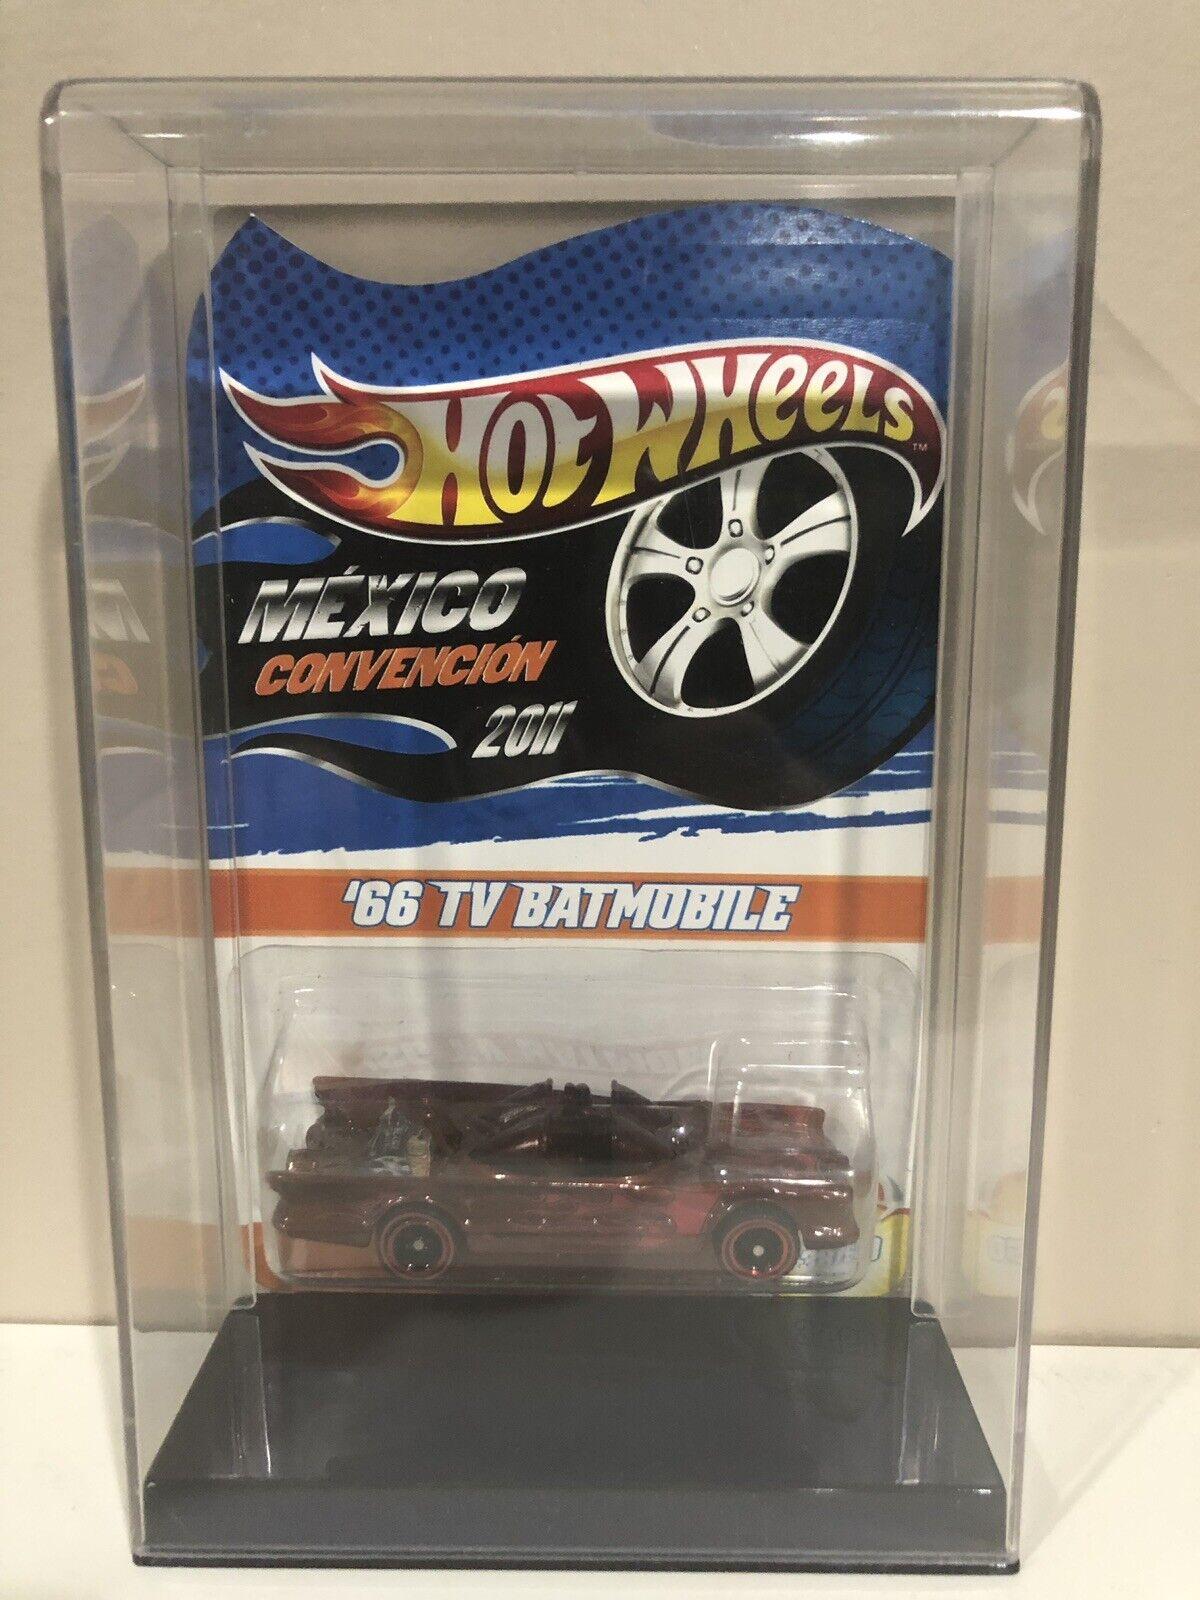 2011 RARE Hot Wheels Mexico Convention 1966 TV Series Batmobile 1 64 MOSC 38 50